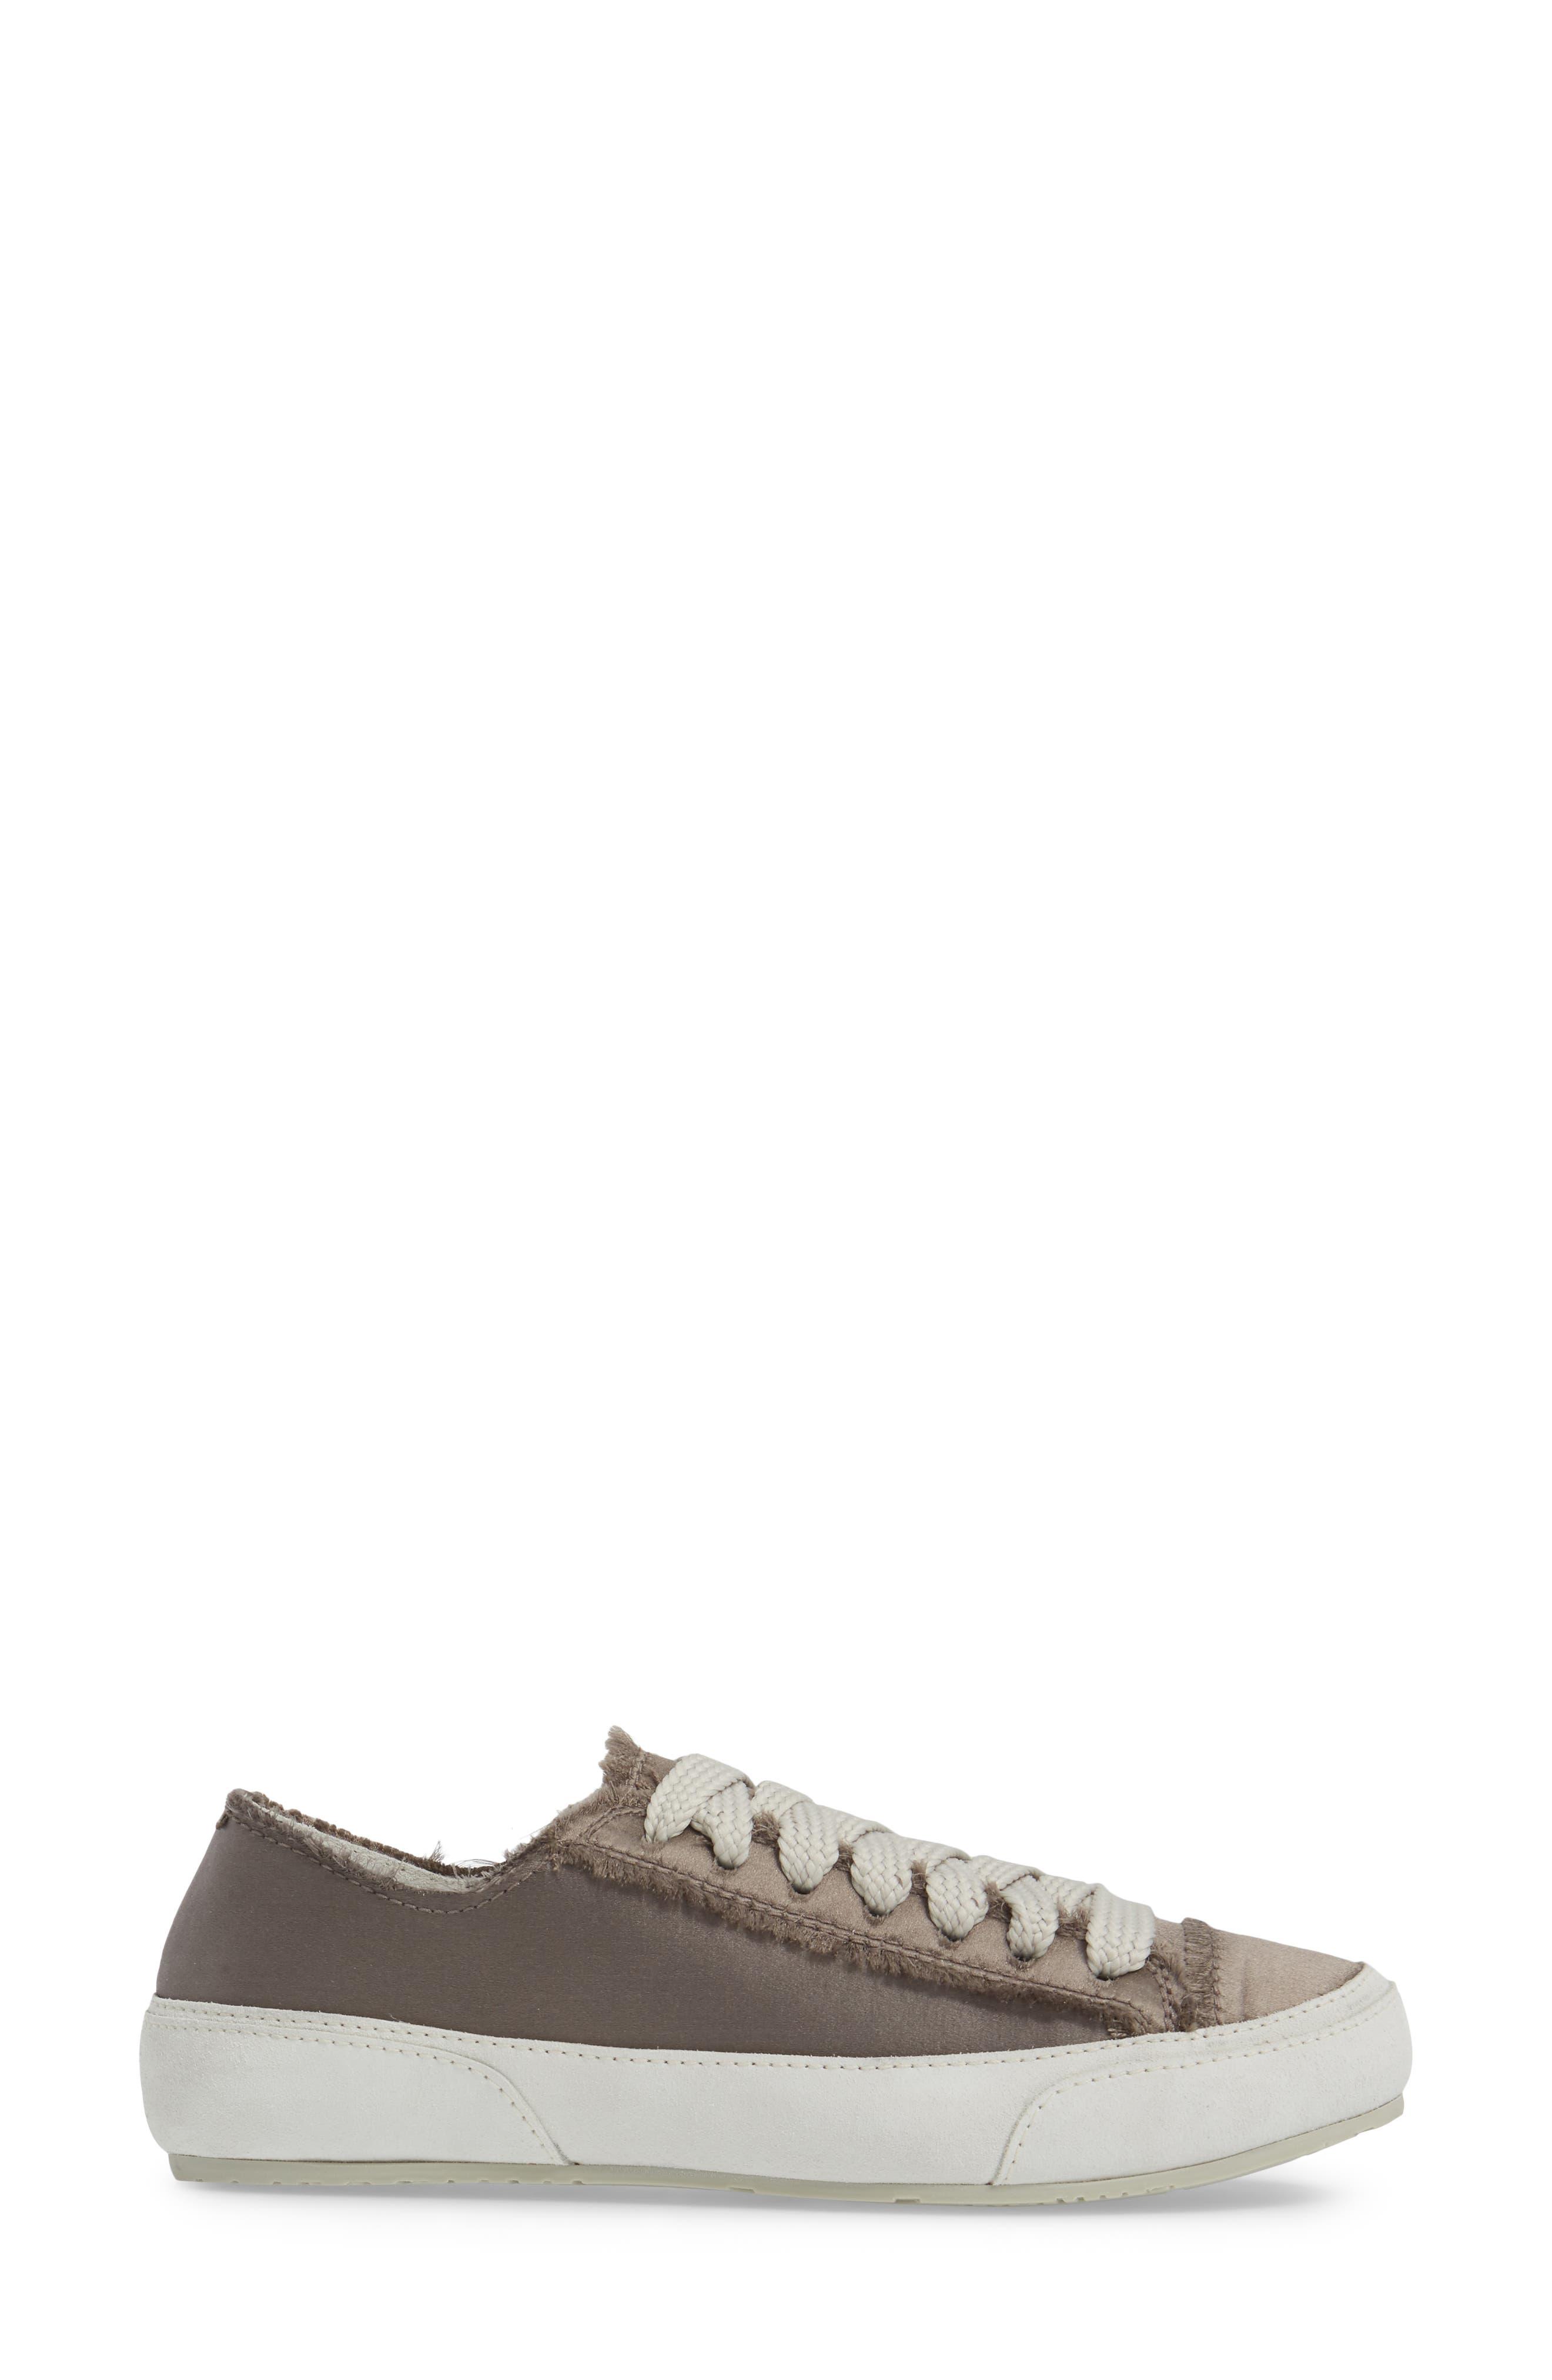 'Parson' Satin Sneaker,                             Alternate thumbnail 2, color,                             Truffle Satin